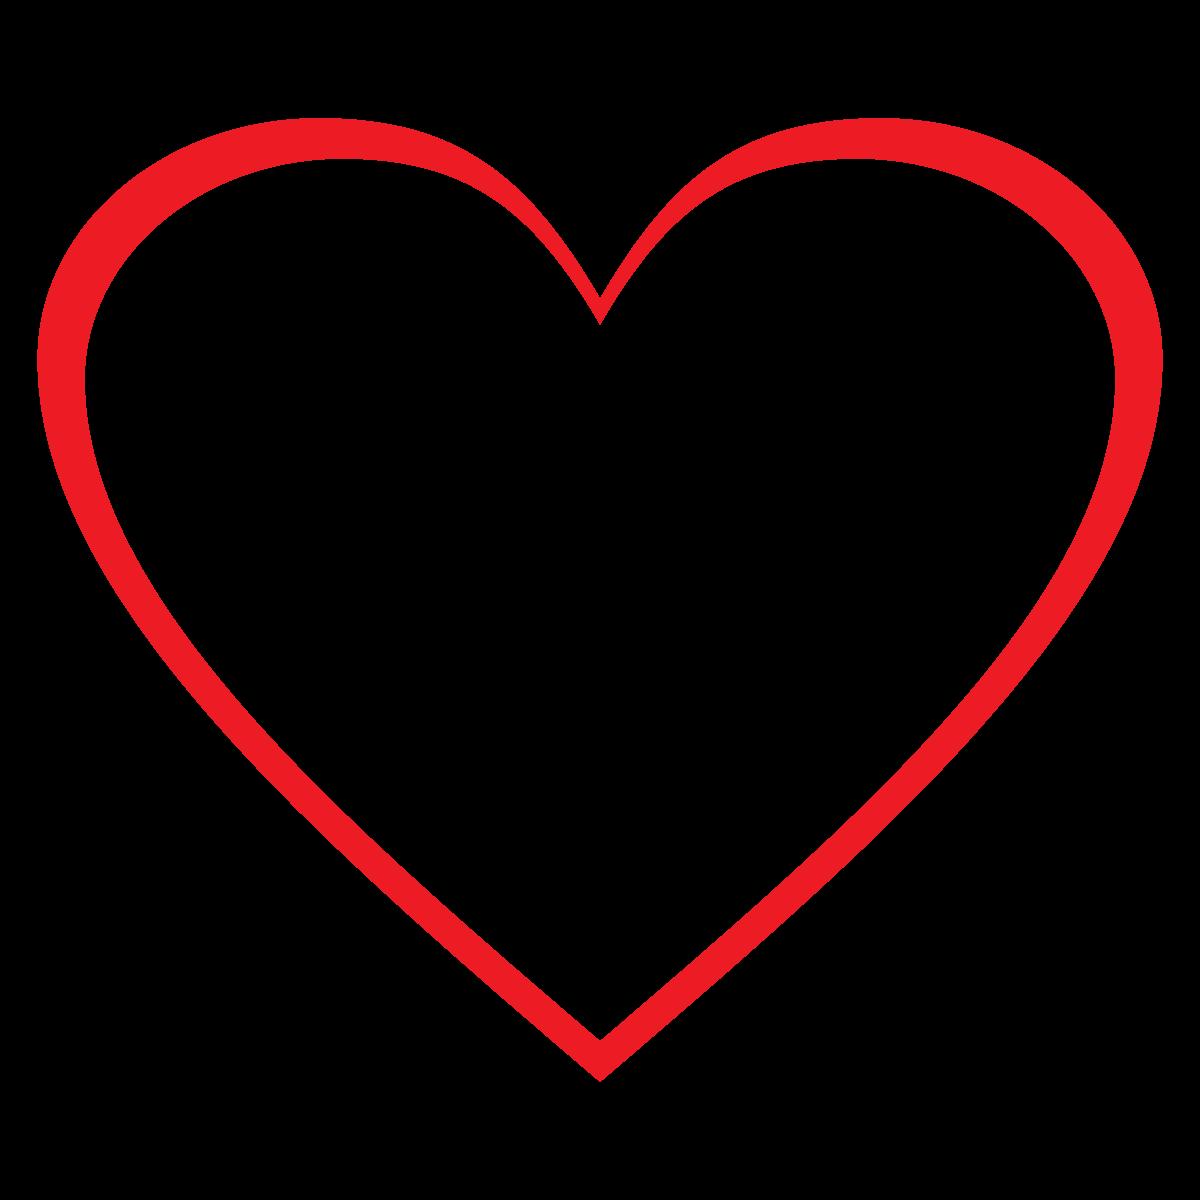 Love Hearts Clip Art Clipart Panda Free -Love Hearts Clip Art Clipart Panda Free Clipart Images-5